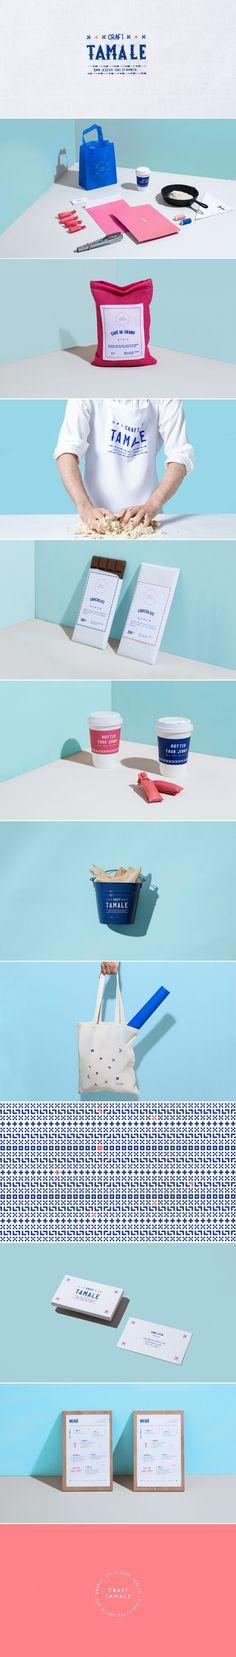 Craft Tamale — The Dieline | Packaging & Branding Design & Innovation News